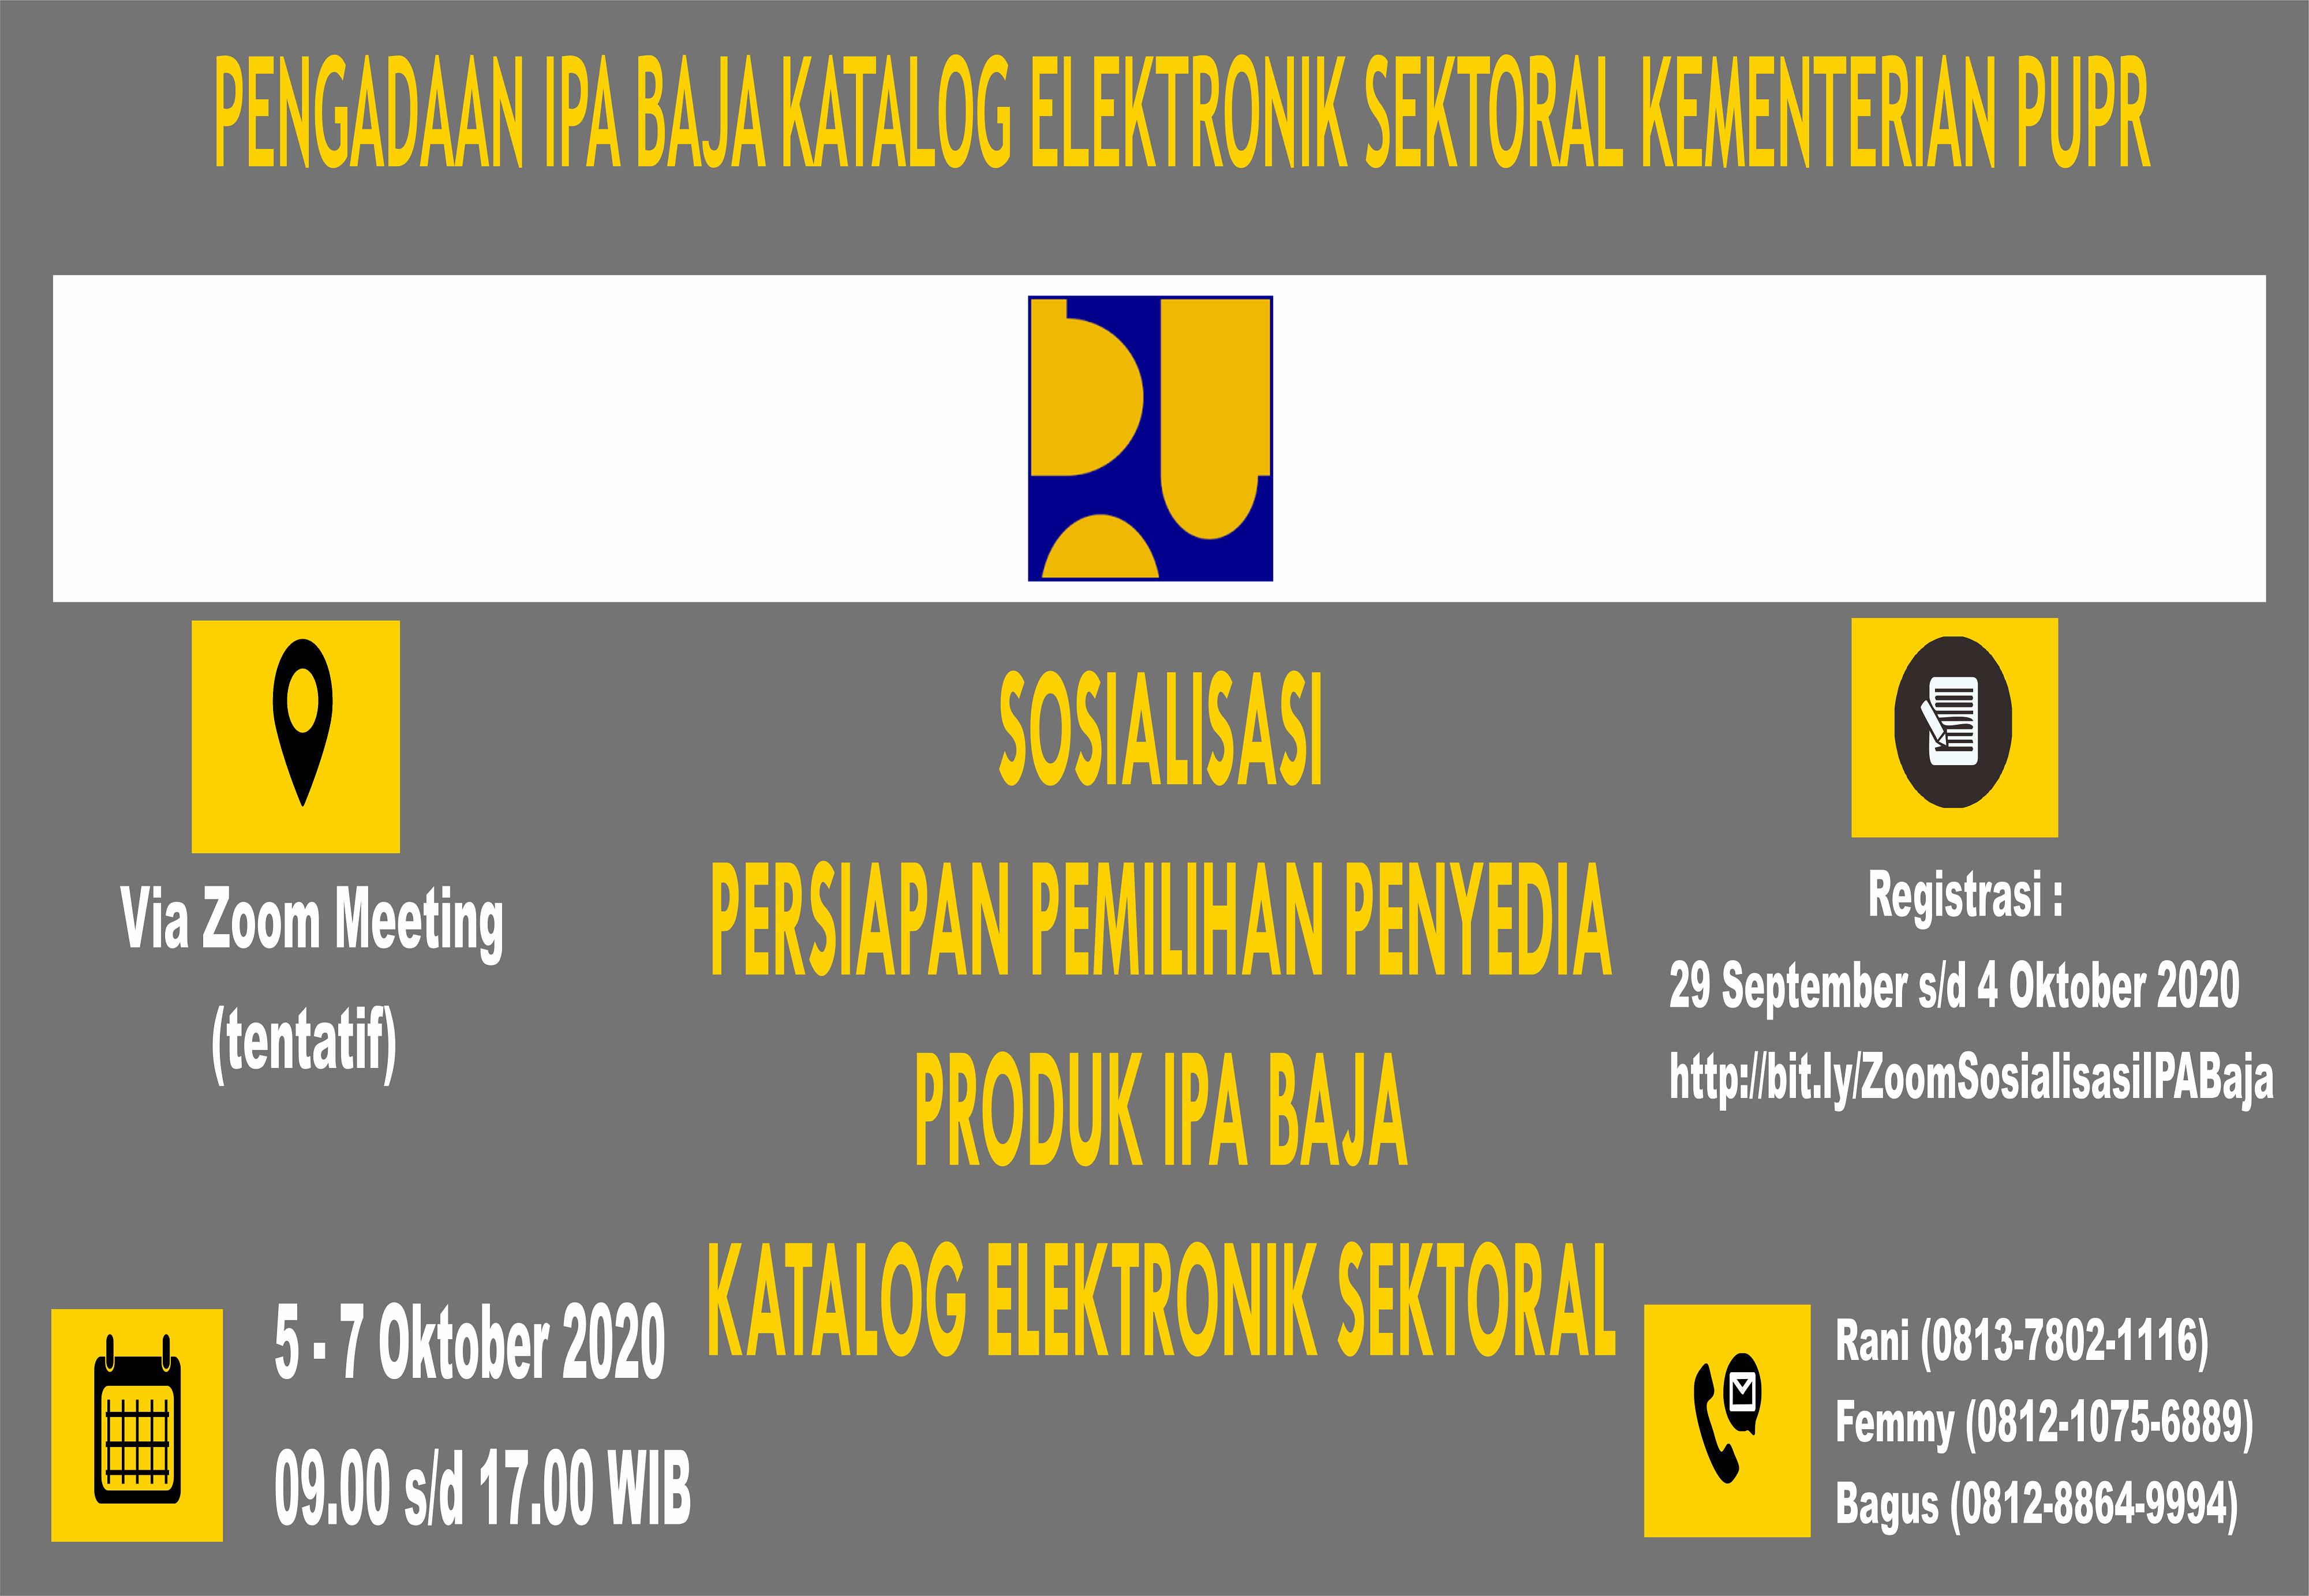 Sosialisasi Persiapan Pelaksanaan Katalog Elektronik Sektoral Produk IPA Paket Baja bidang Cipta Karya